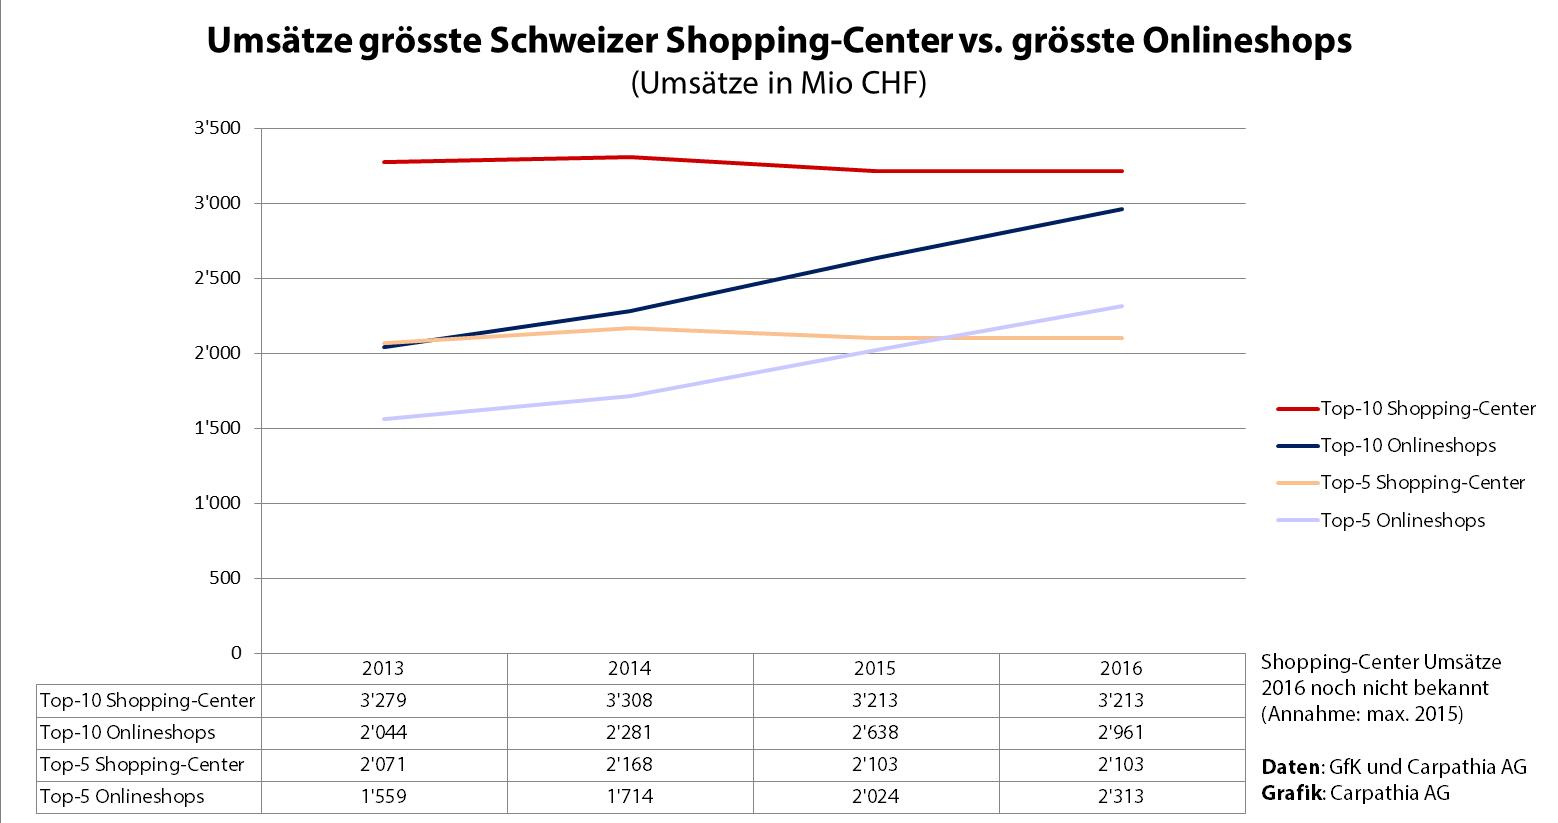 Umsätze grösste Schweizer Shopping-Center vs. grösste Onlineshops - Quelle: GfK/Carpathia AG - Grafik: Carpathia AG 2017